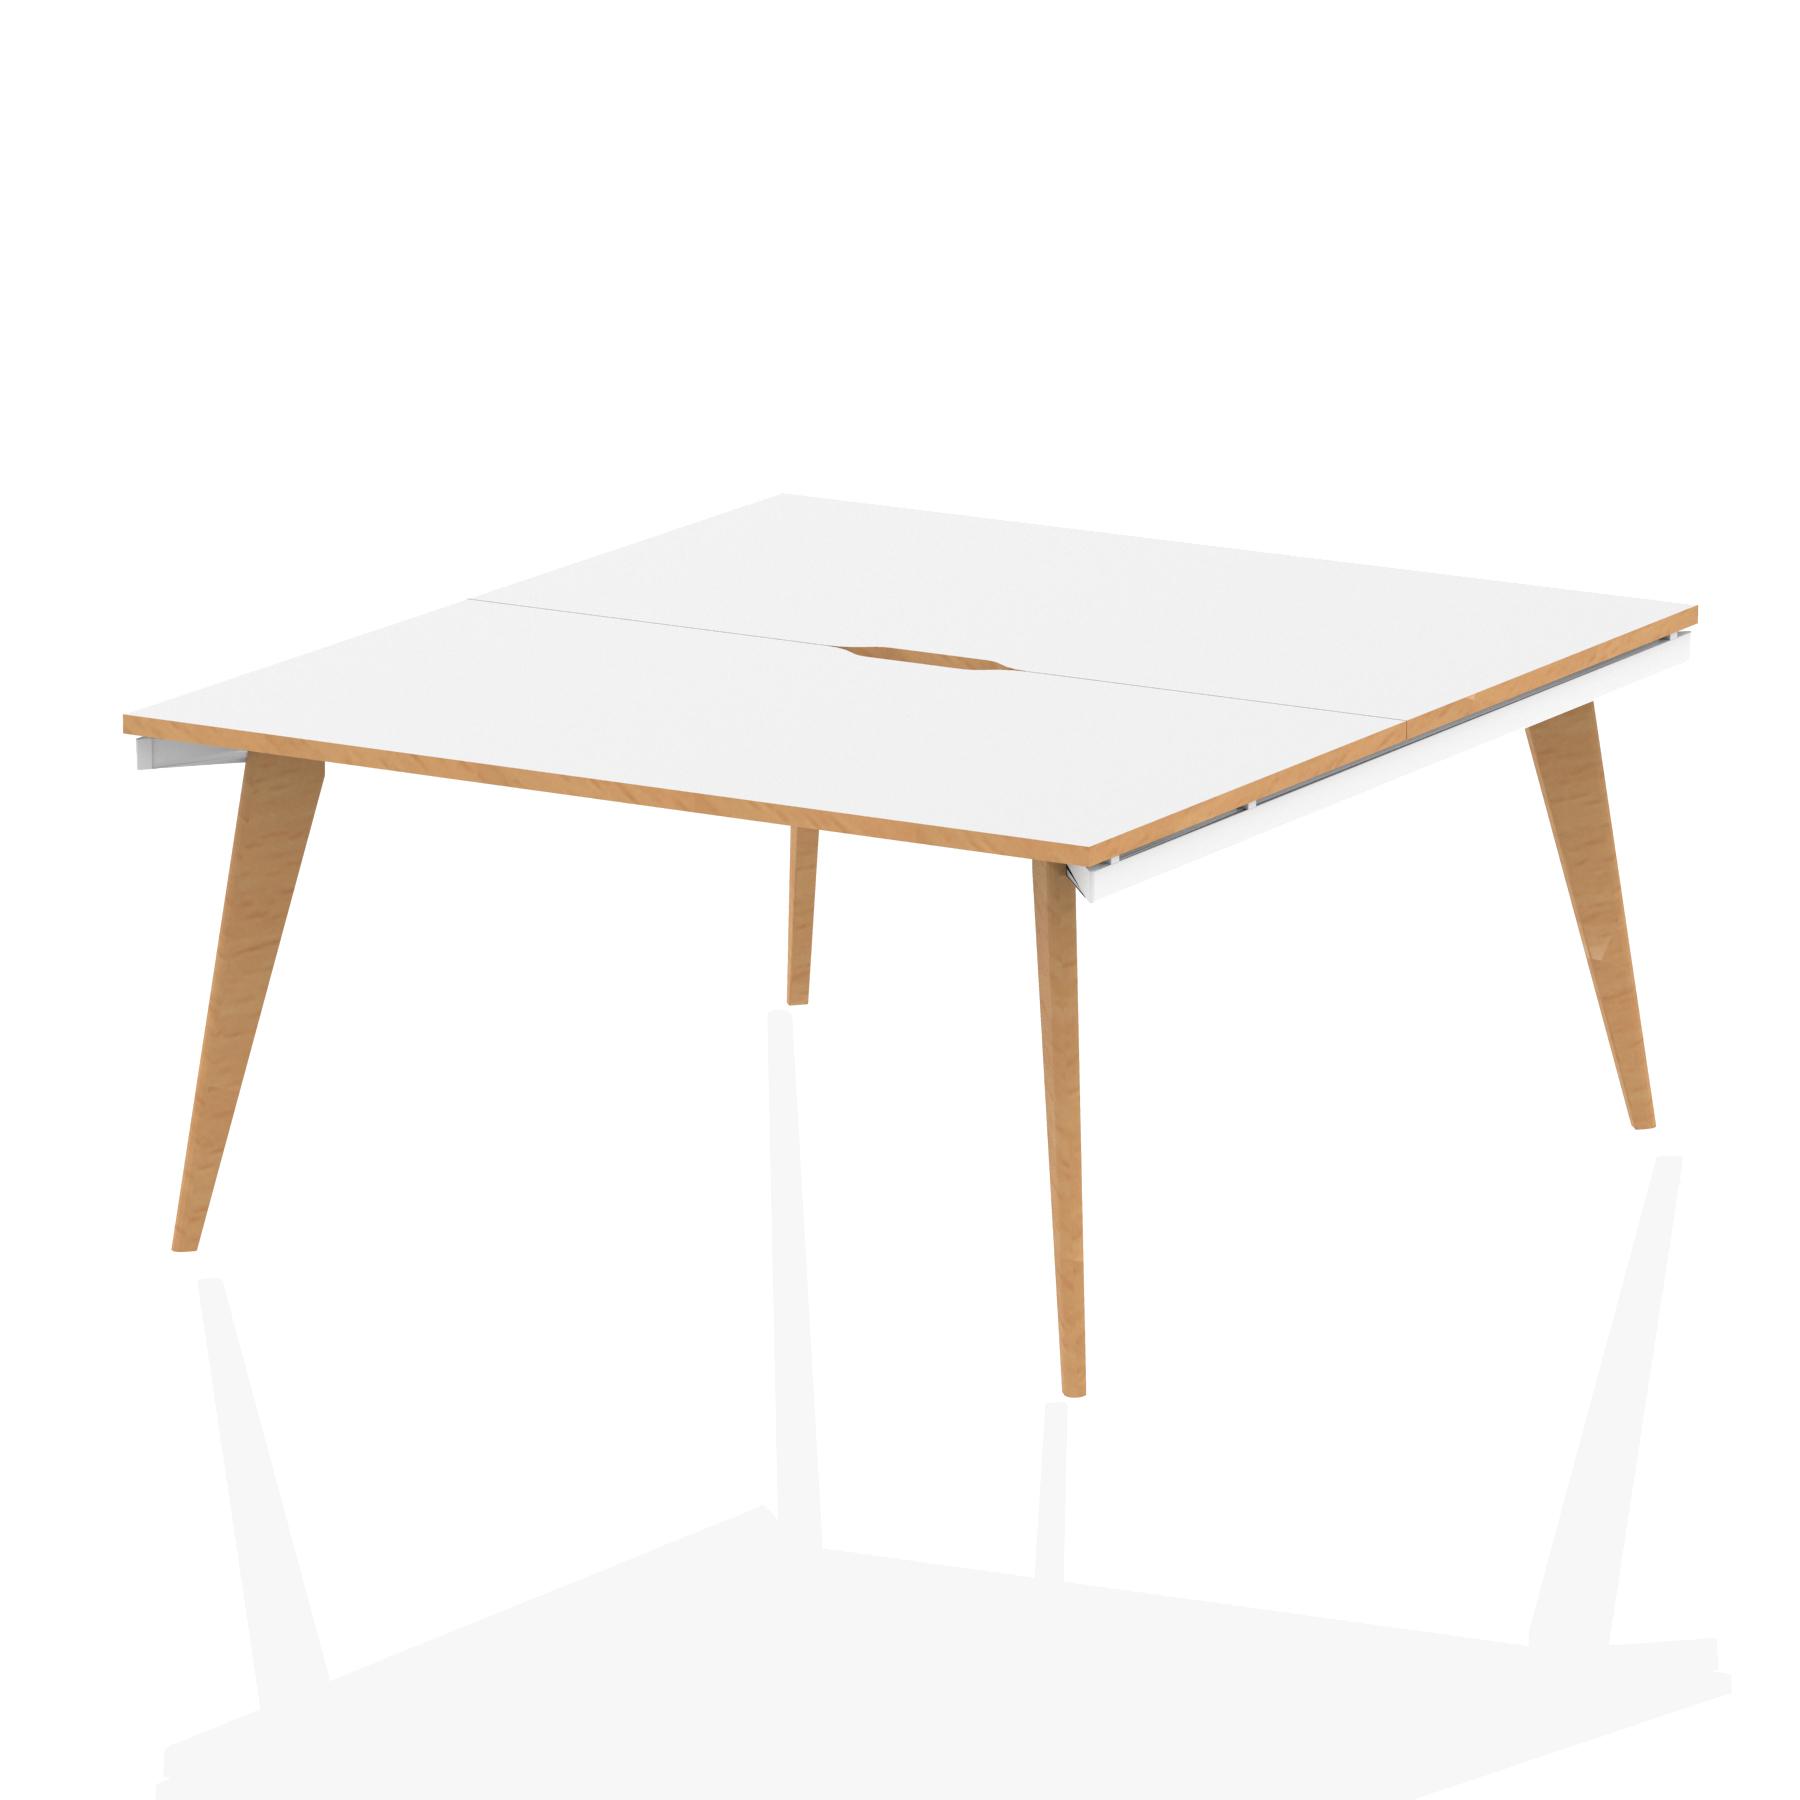 Oslo B2B White Frame Wooden Leg Bench Desk 1400 White With Natural Wood Edge (2 Pod)